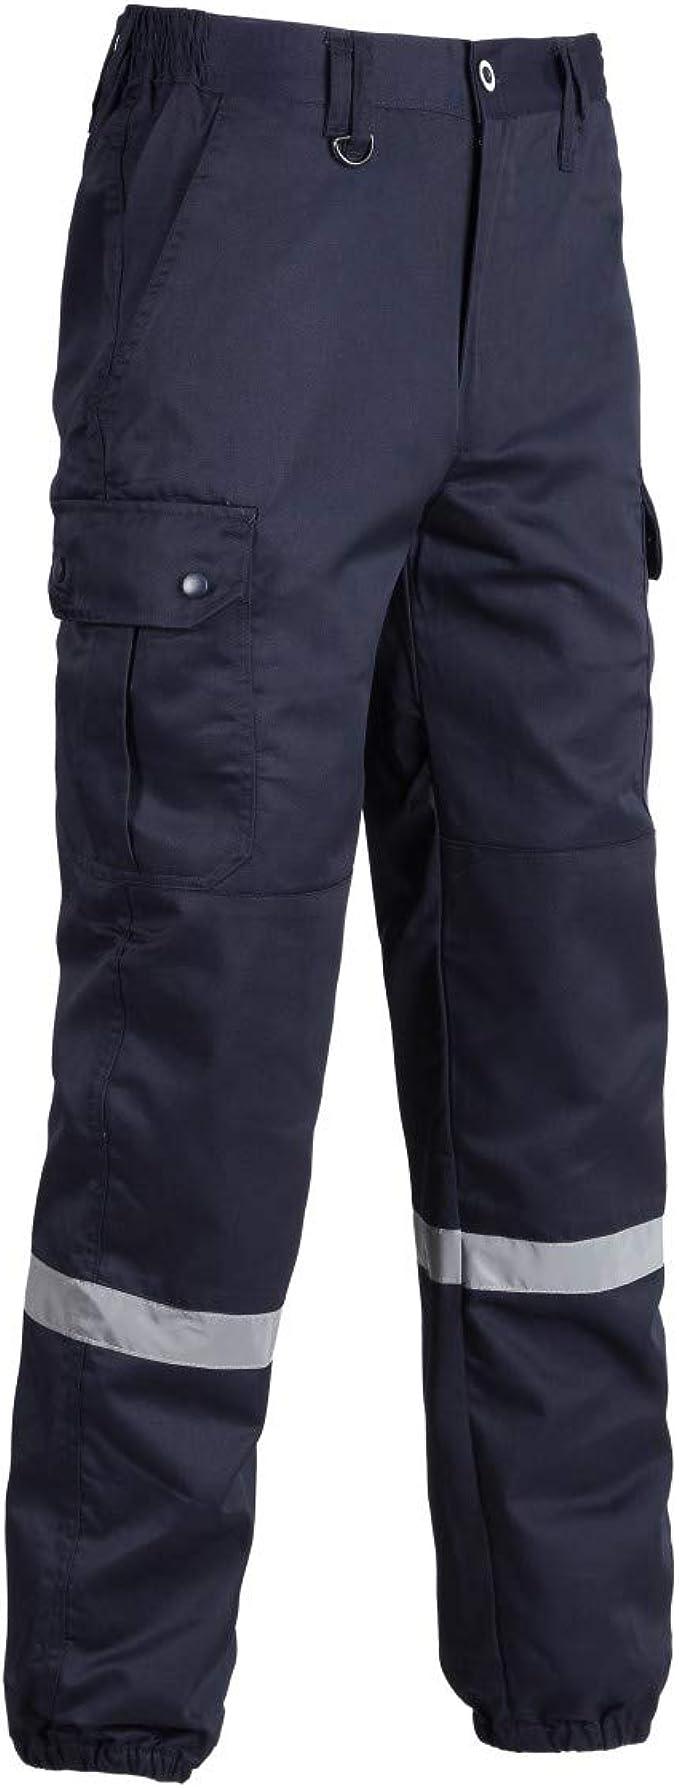 Pantalon ambulancier avec bandes reflechissantes NW